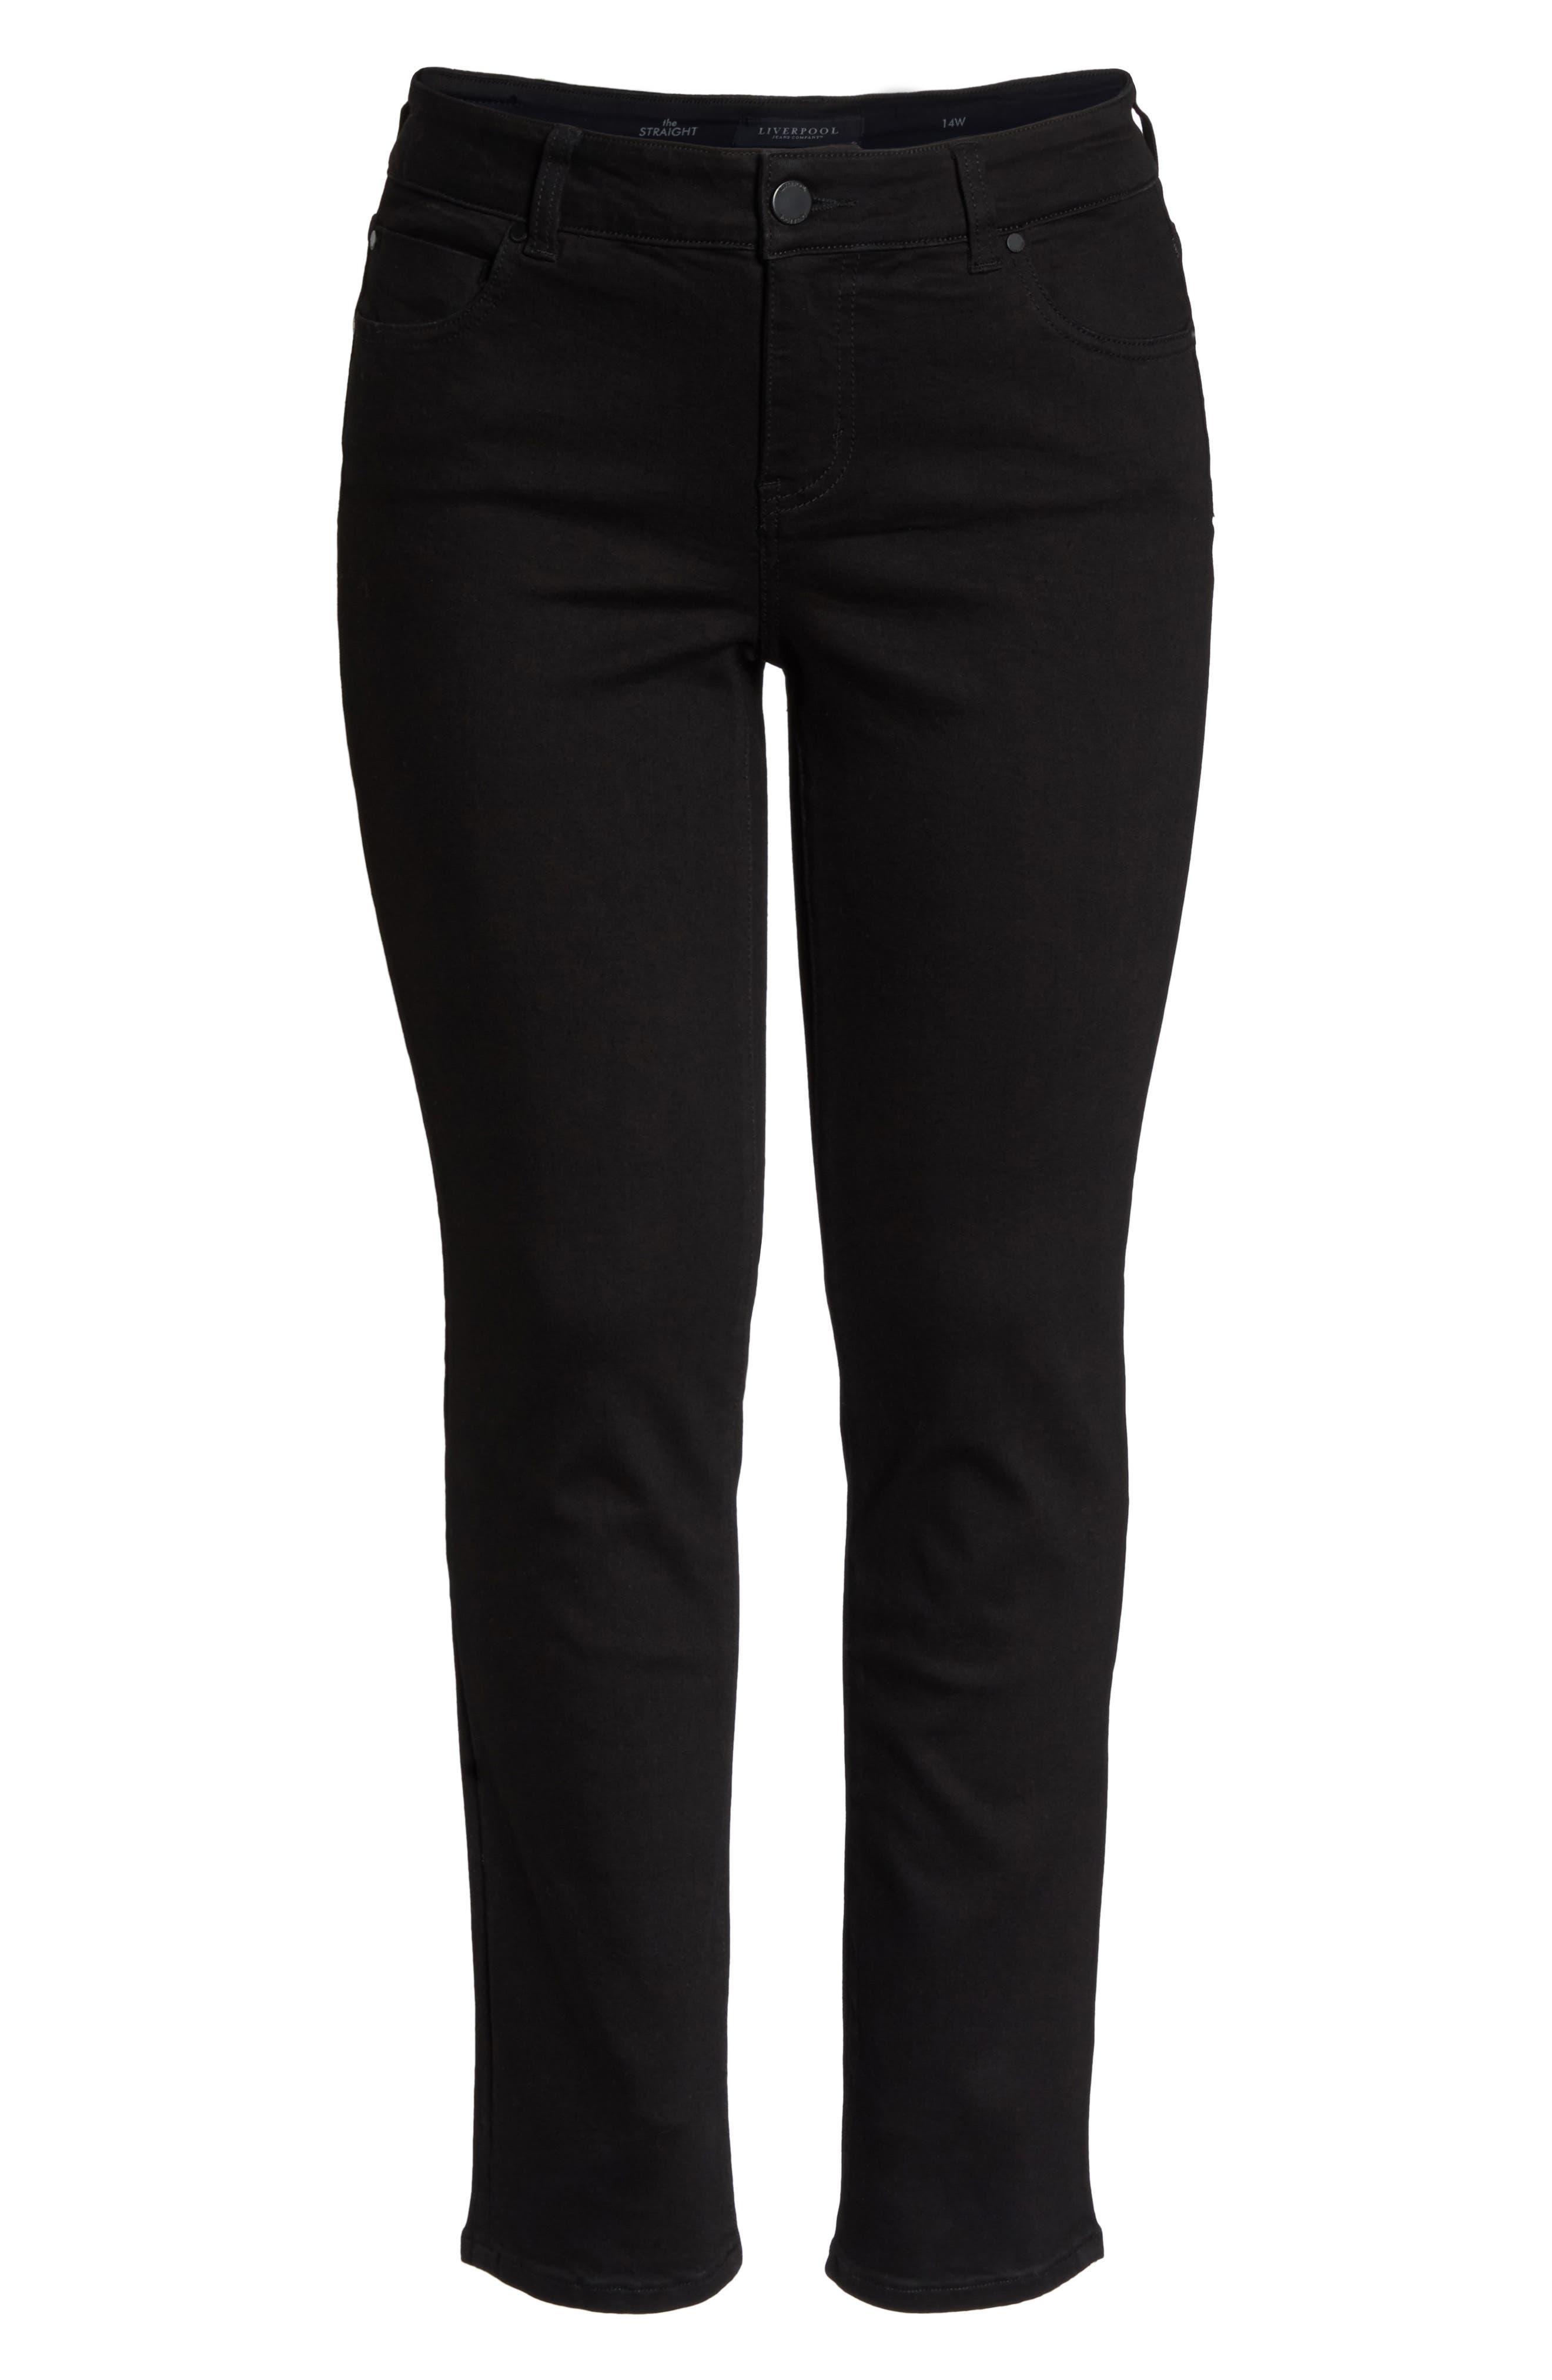 Sadie Stretch Straight Jeans,                             Alternate thumbnail 7, color,                             BLACK RINSE